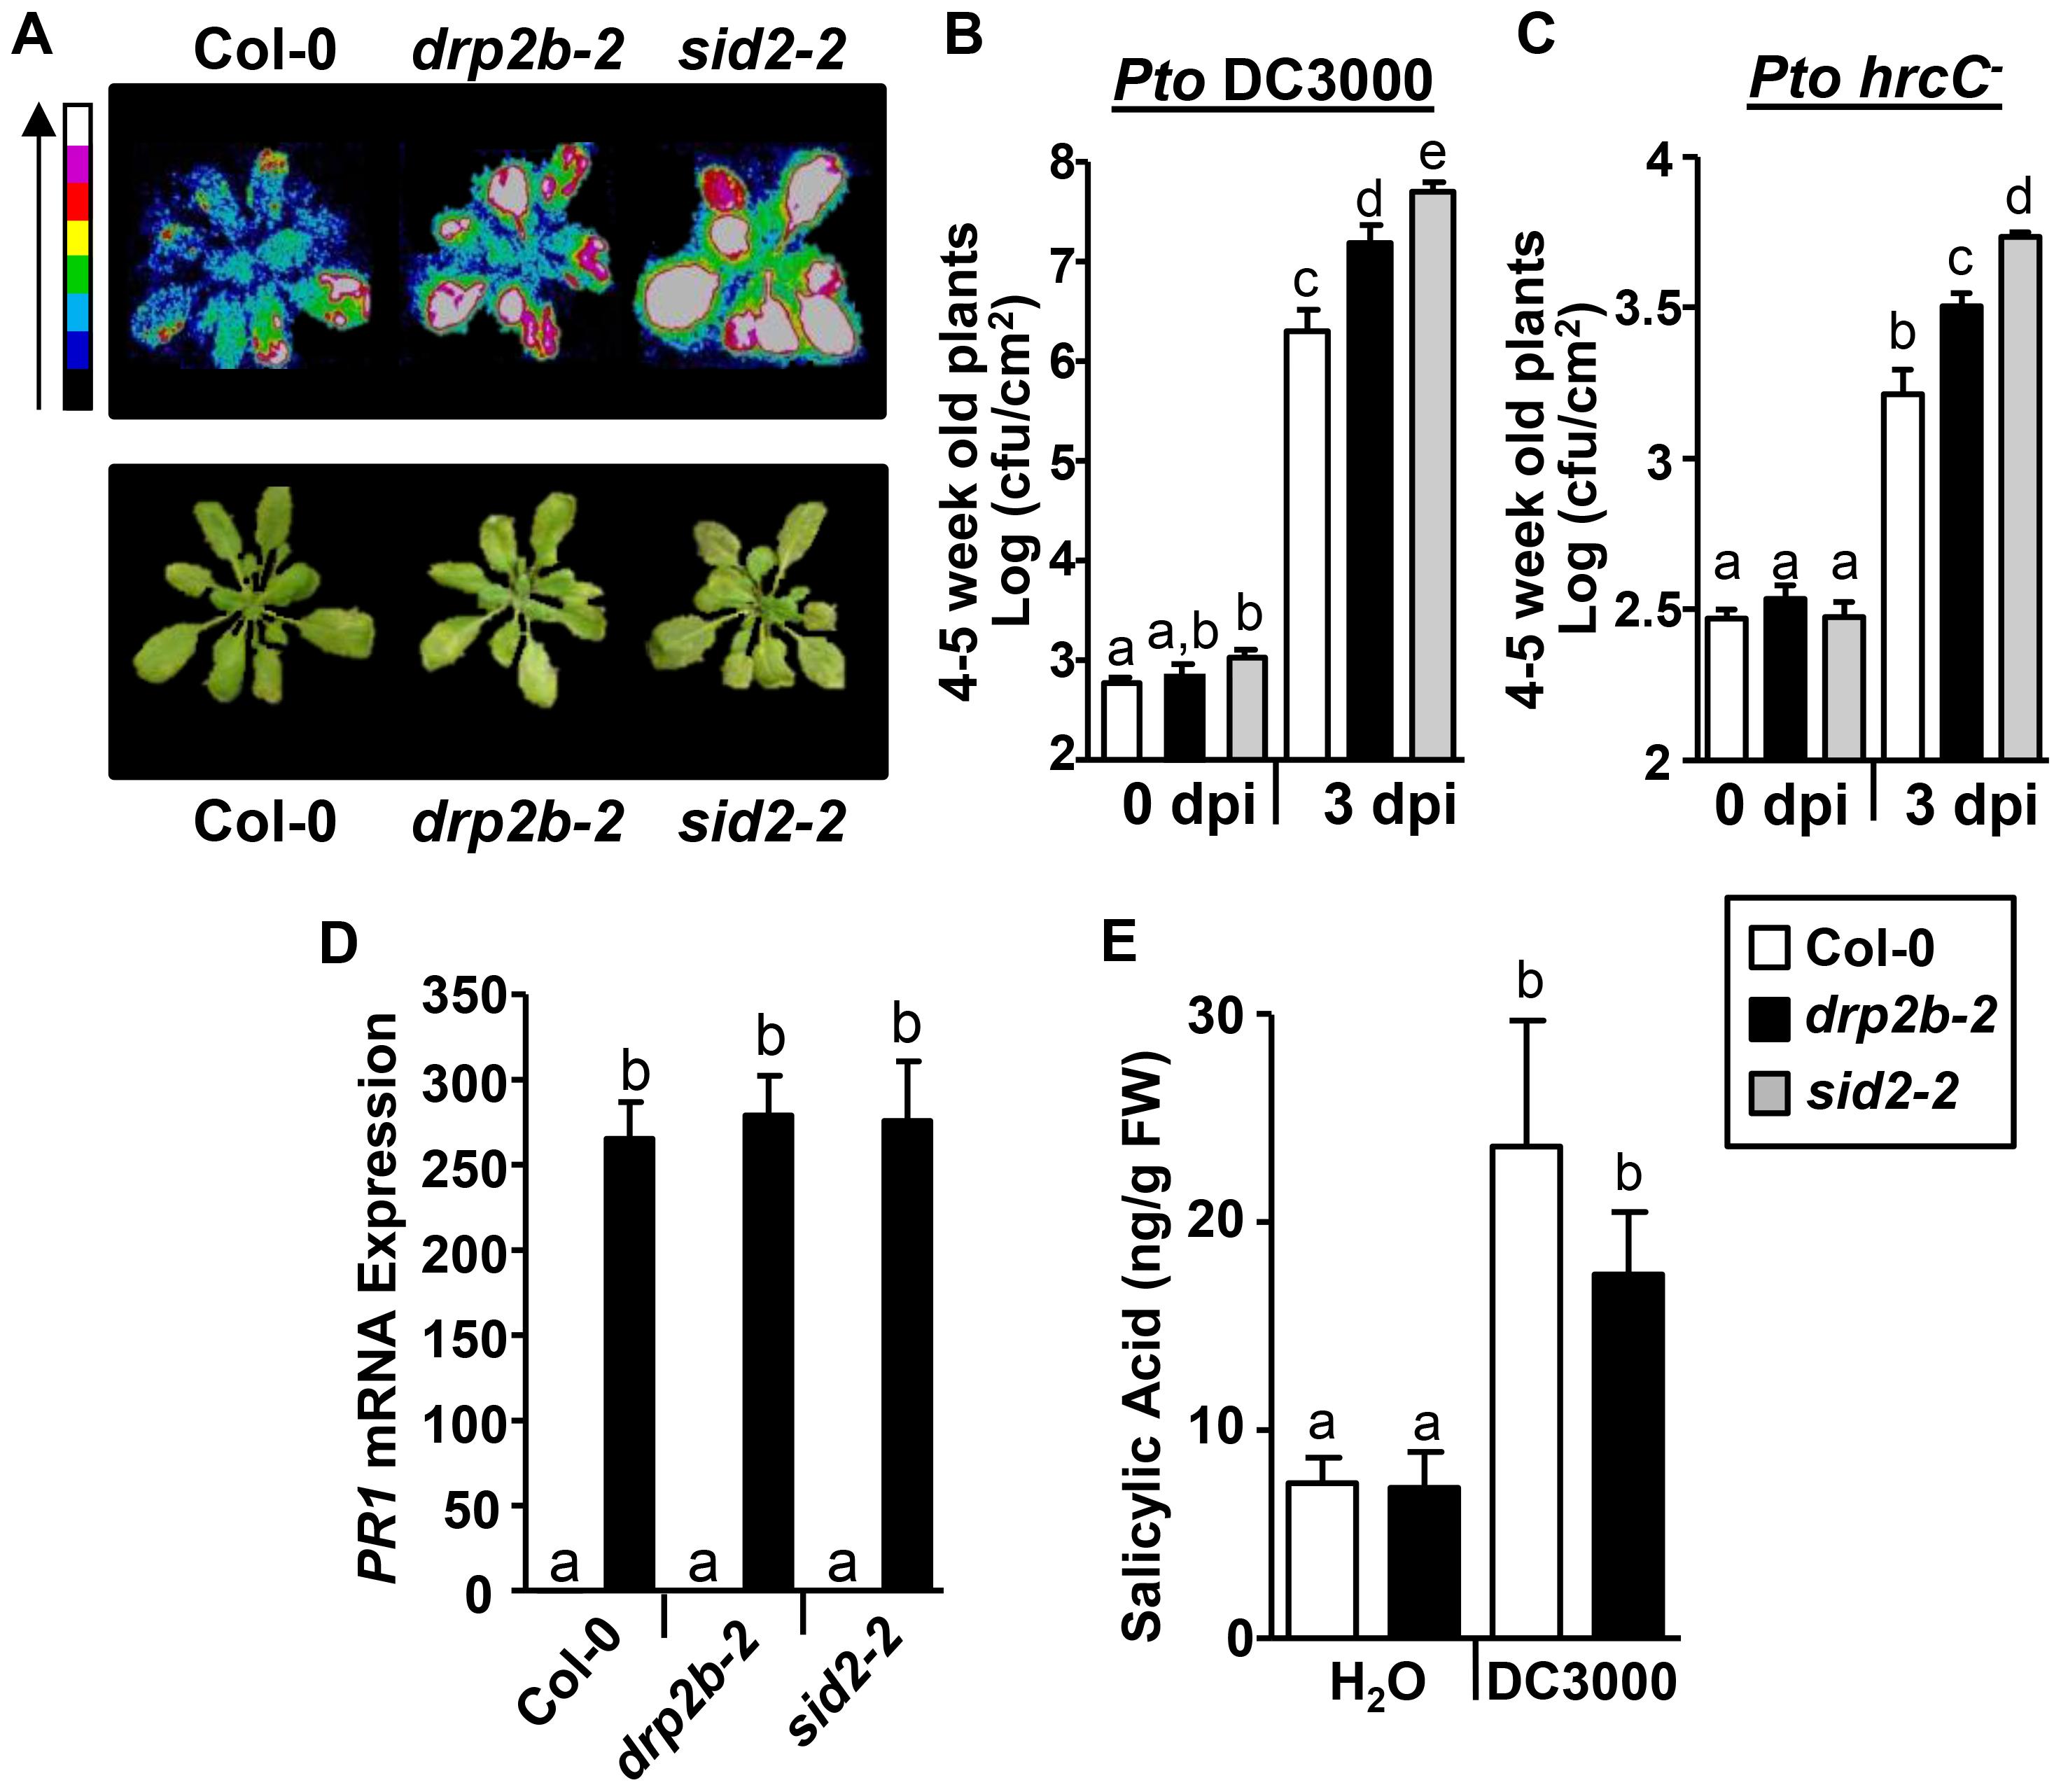 <i>drp2b</i> single mutants are more susceptible to <i>Pseudomonas syringae</i> pv. <i>tomato</i> (<i>Pto</i>) DC3000 and <i>Pto hrcC<sup>−</sup></i> infection.